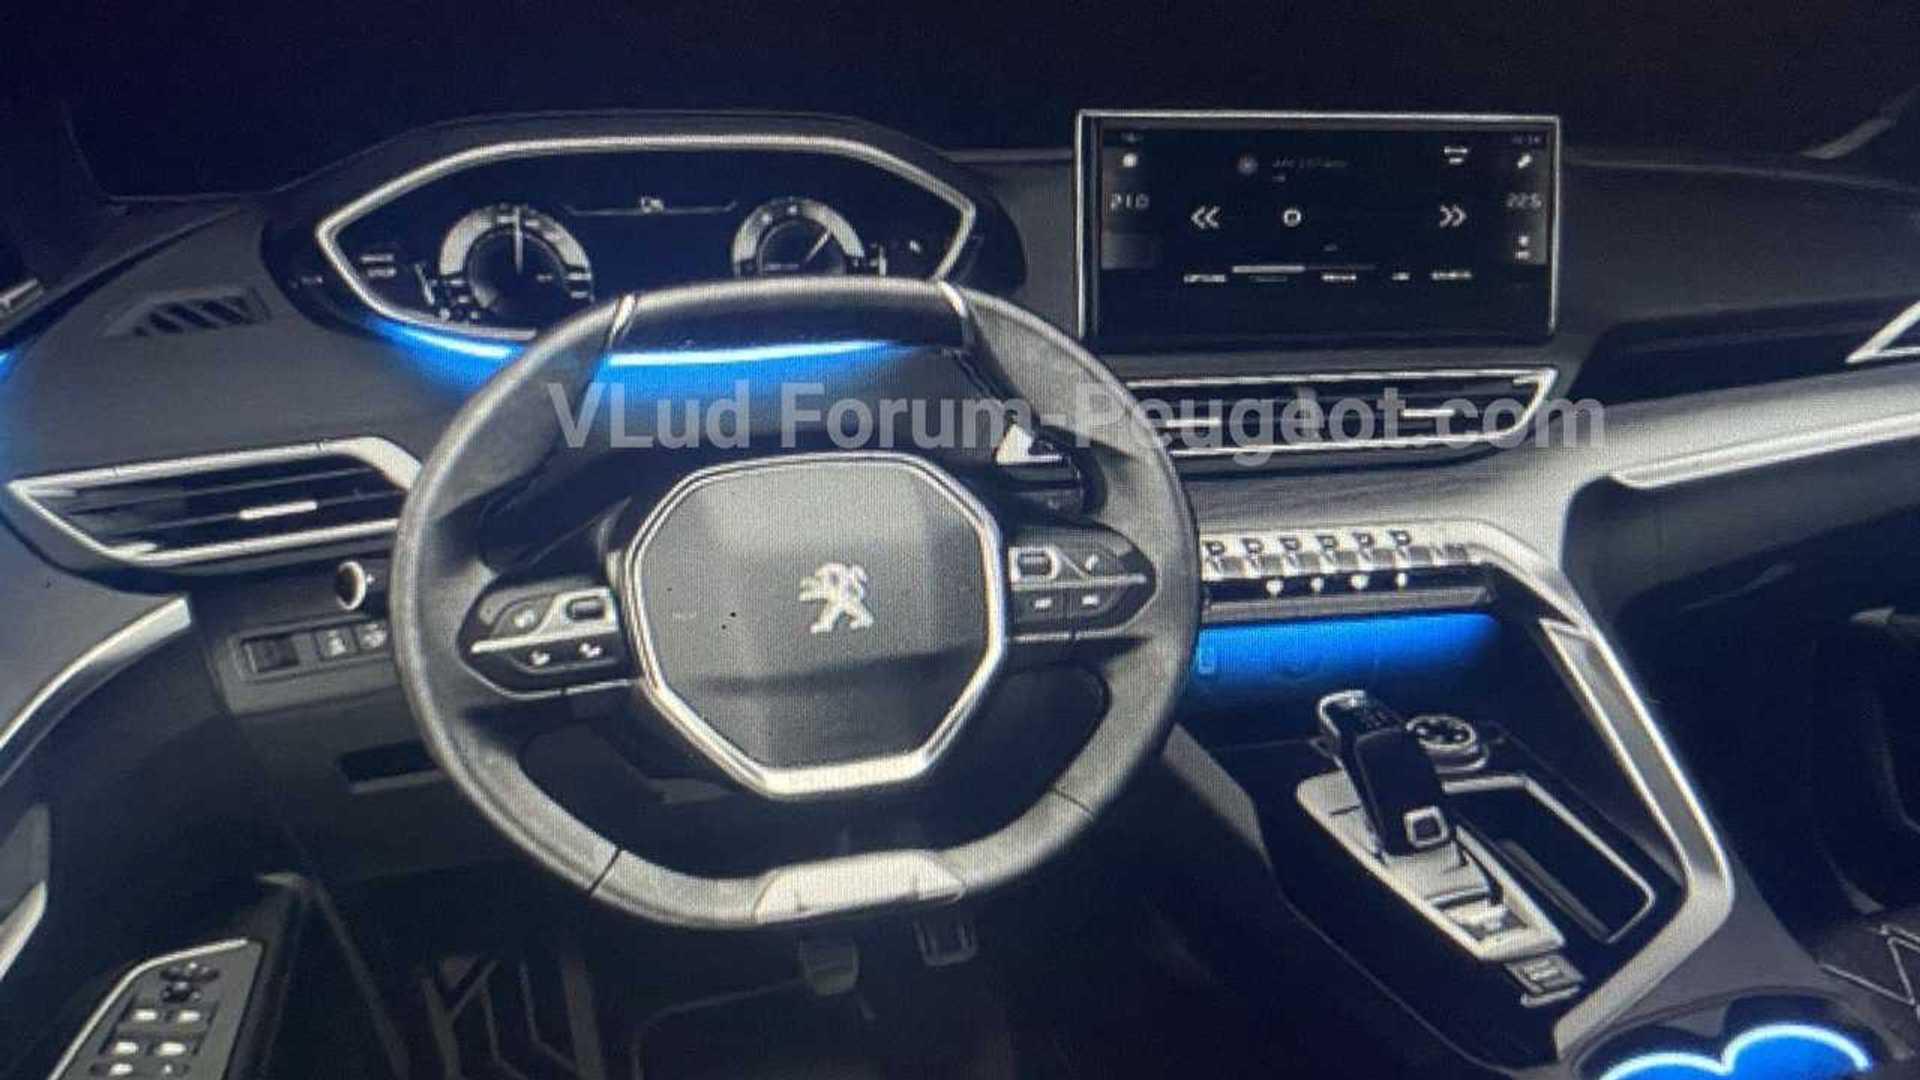 Peugeot 3008 reestilizado - Imagens vazadas